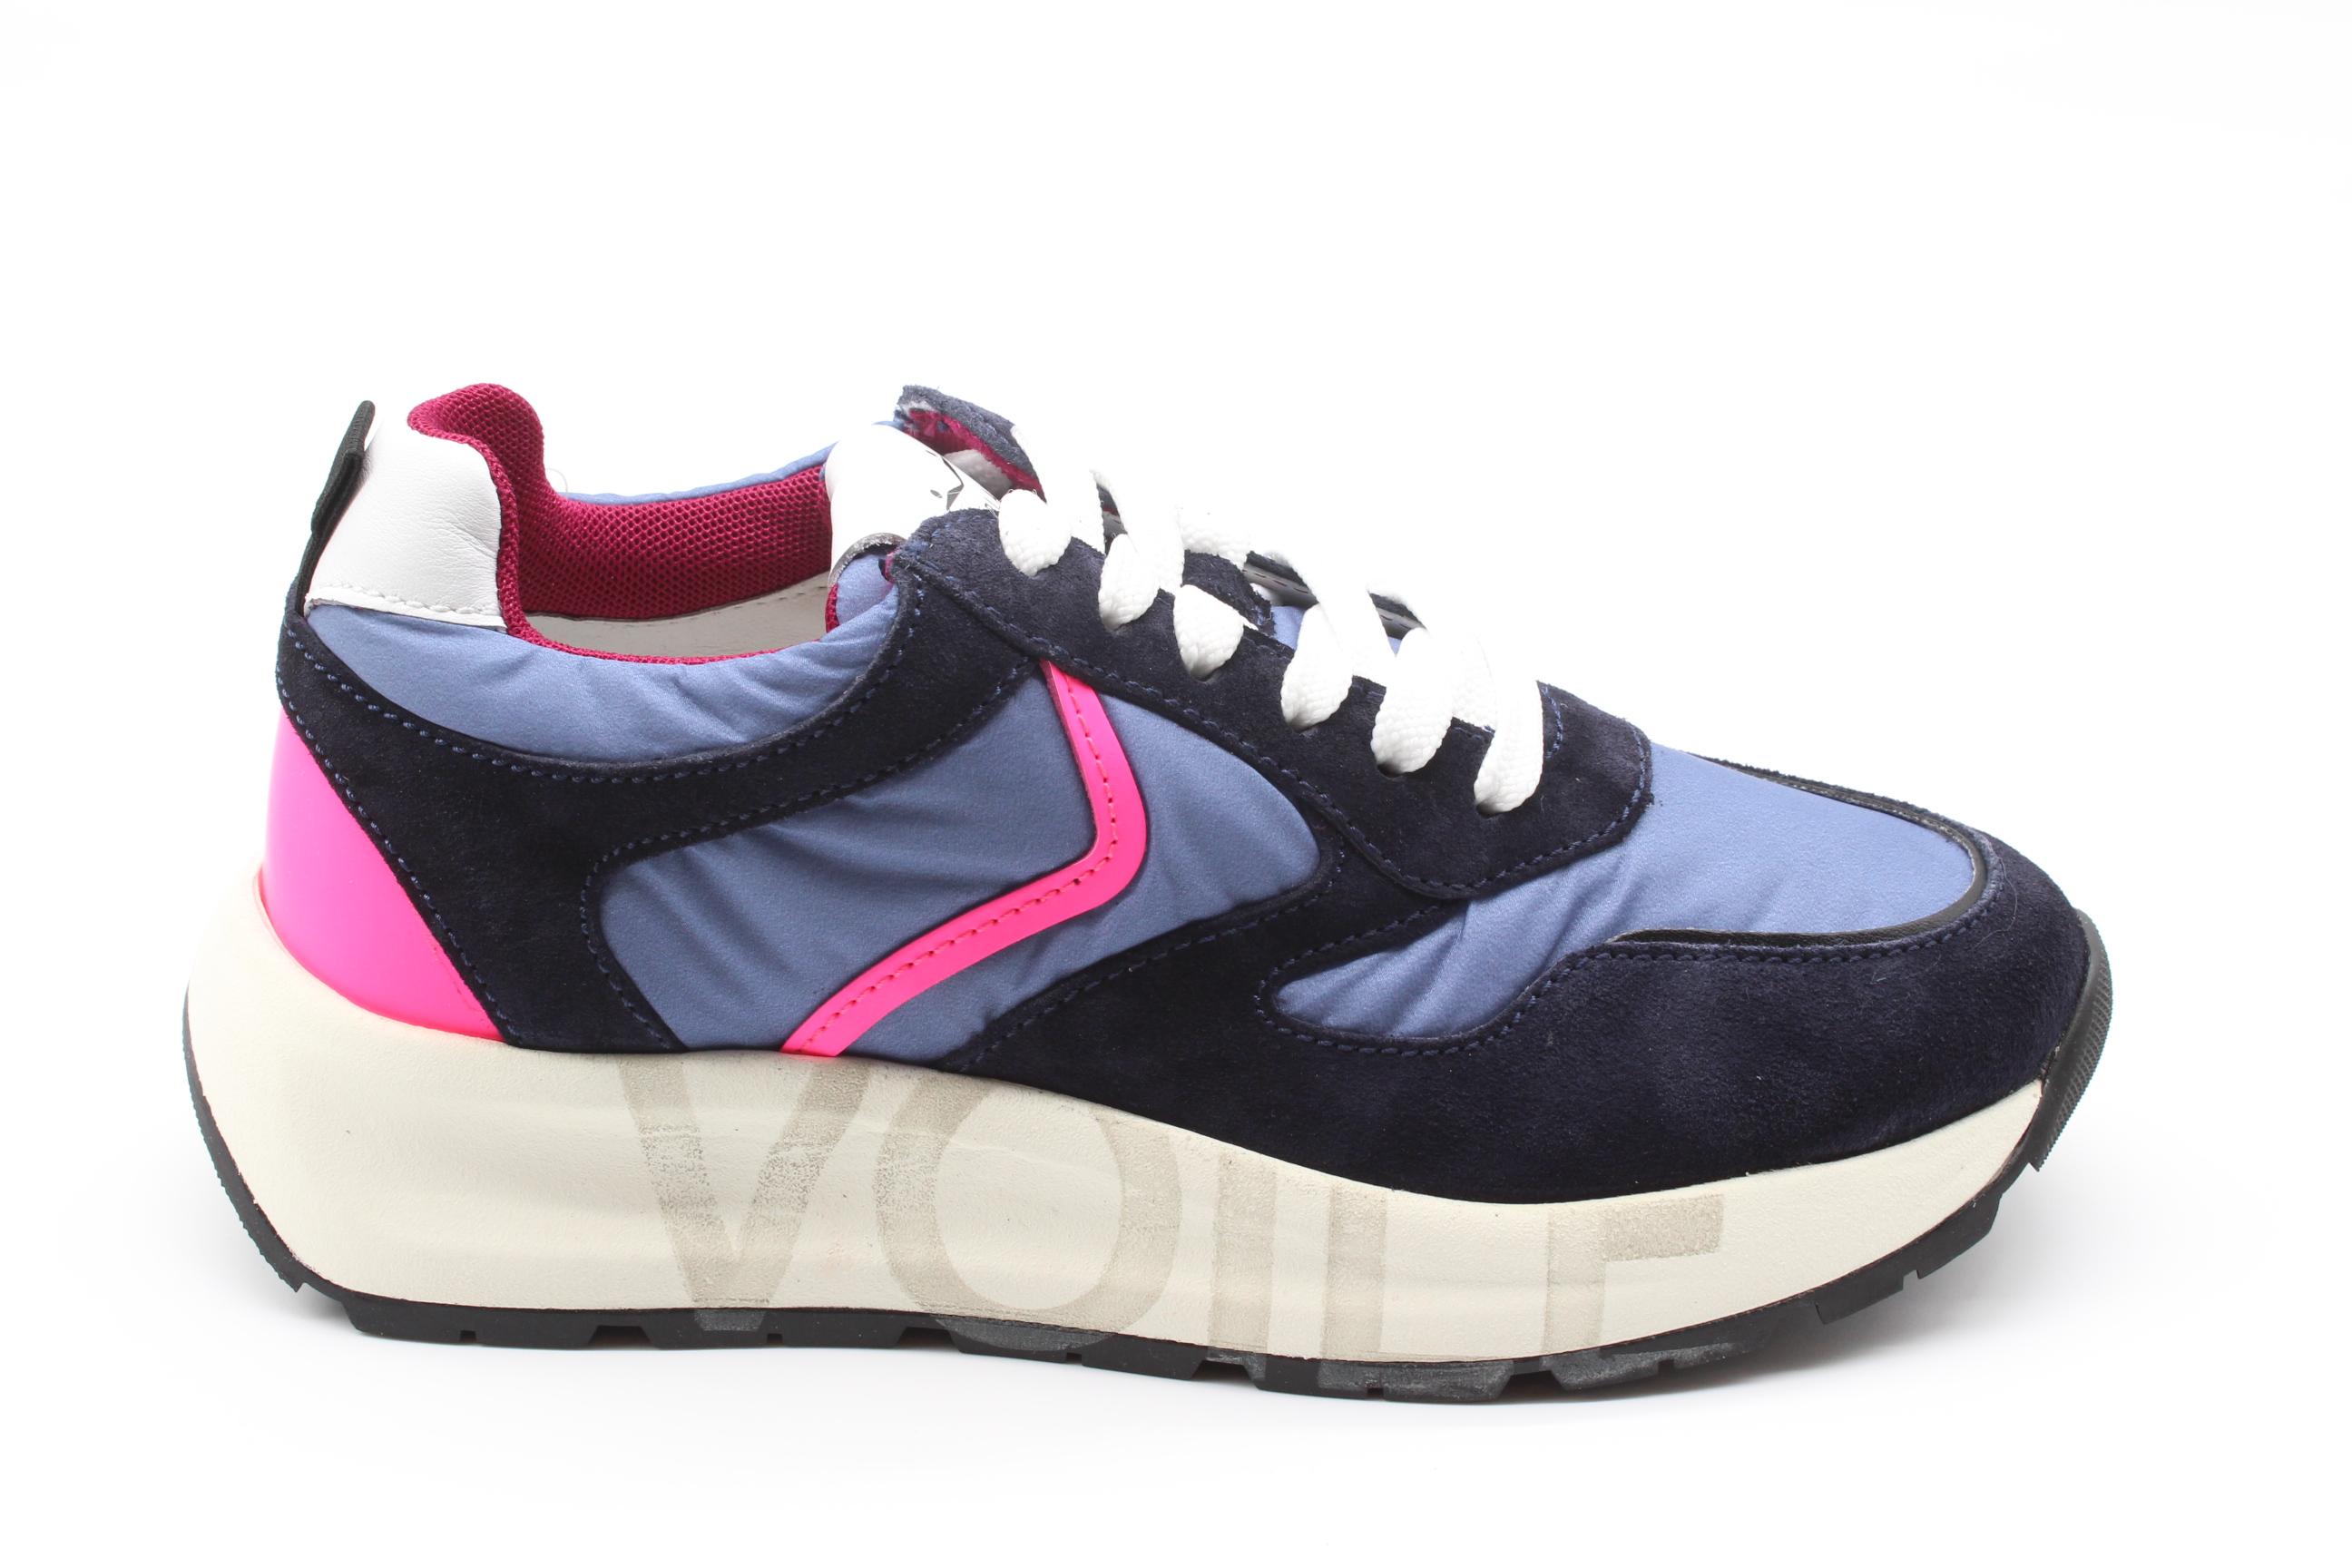 Voile Blanche Donna Sneaker Flowee